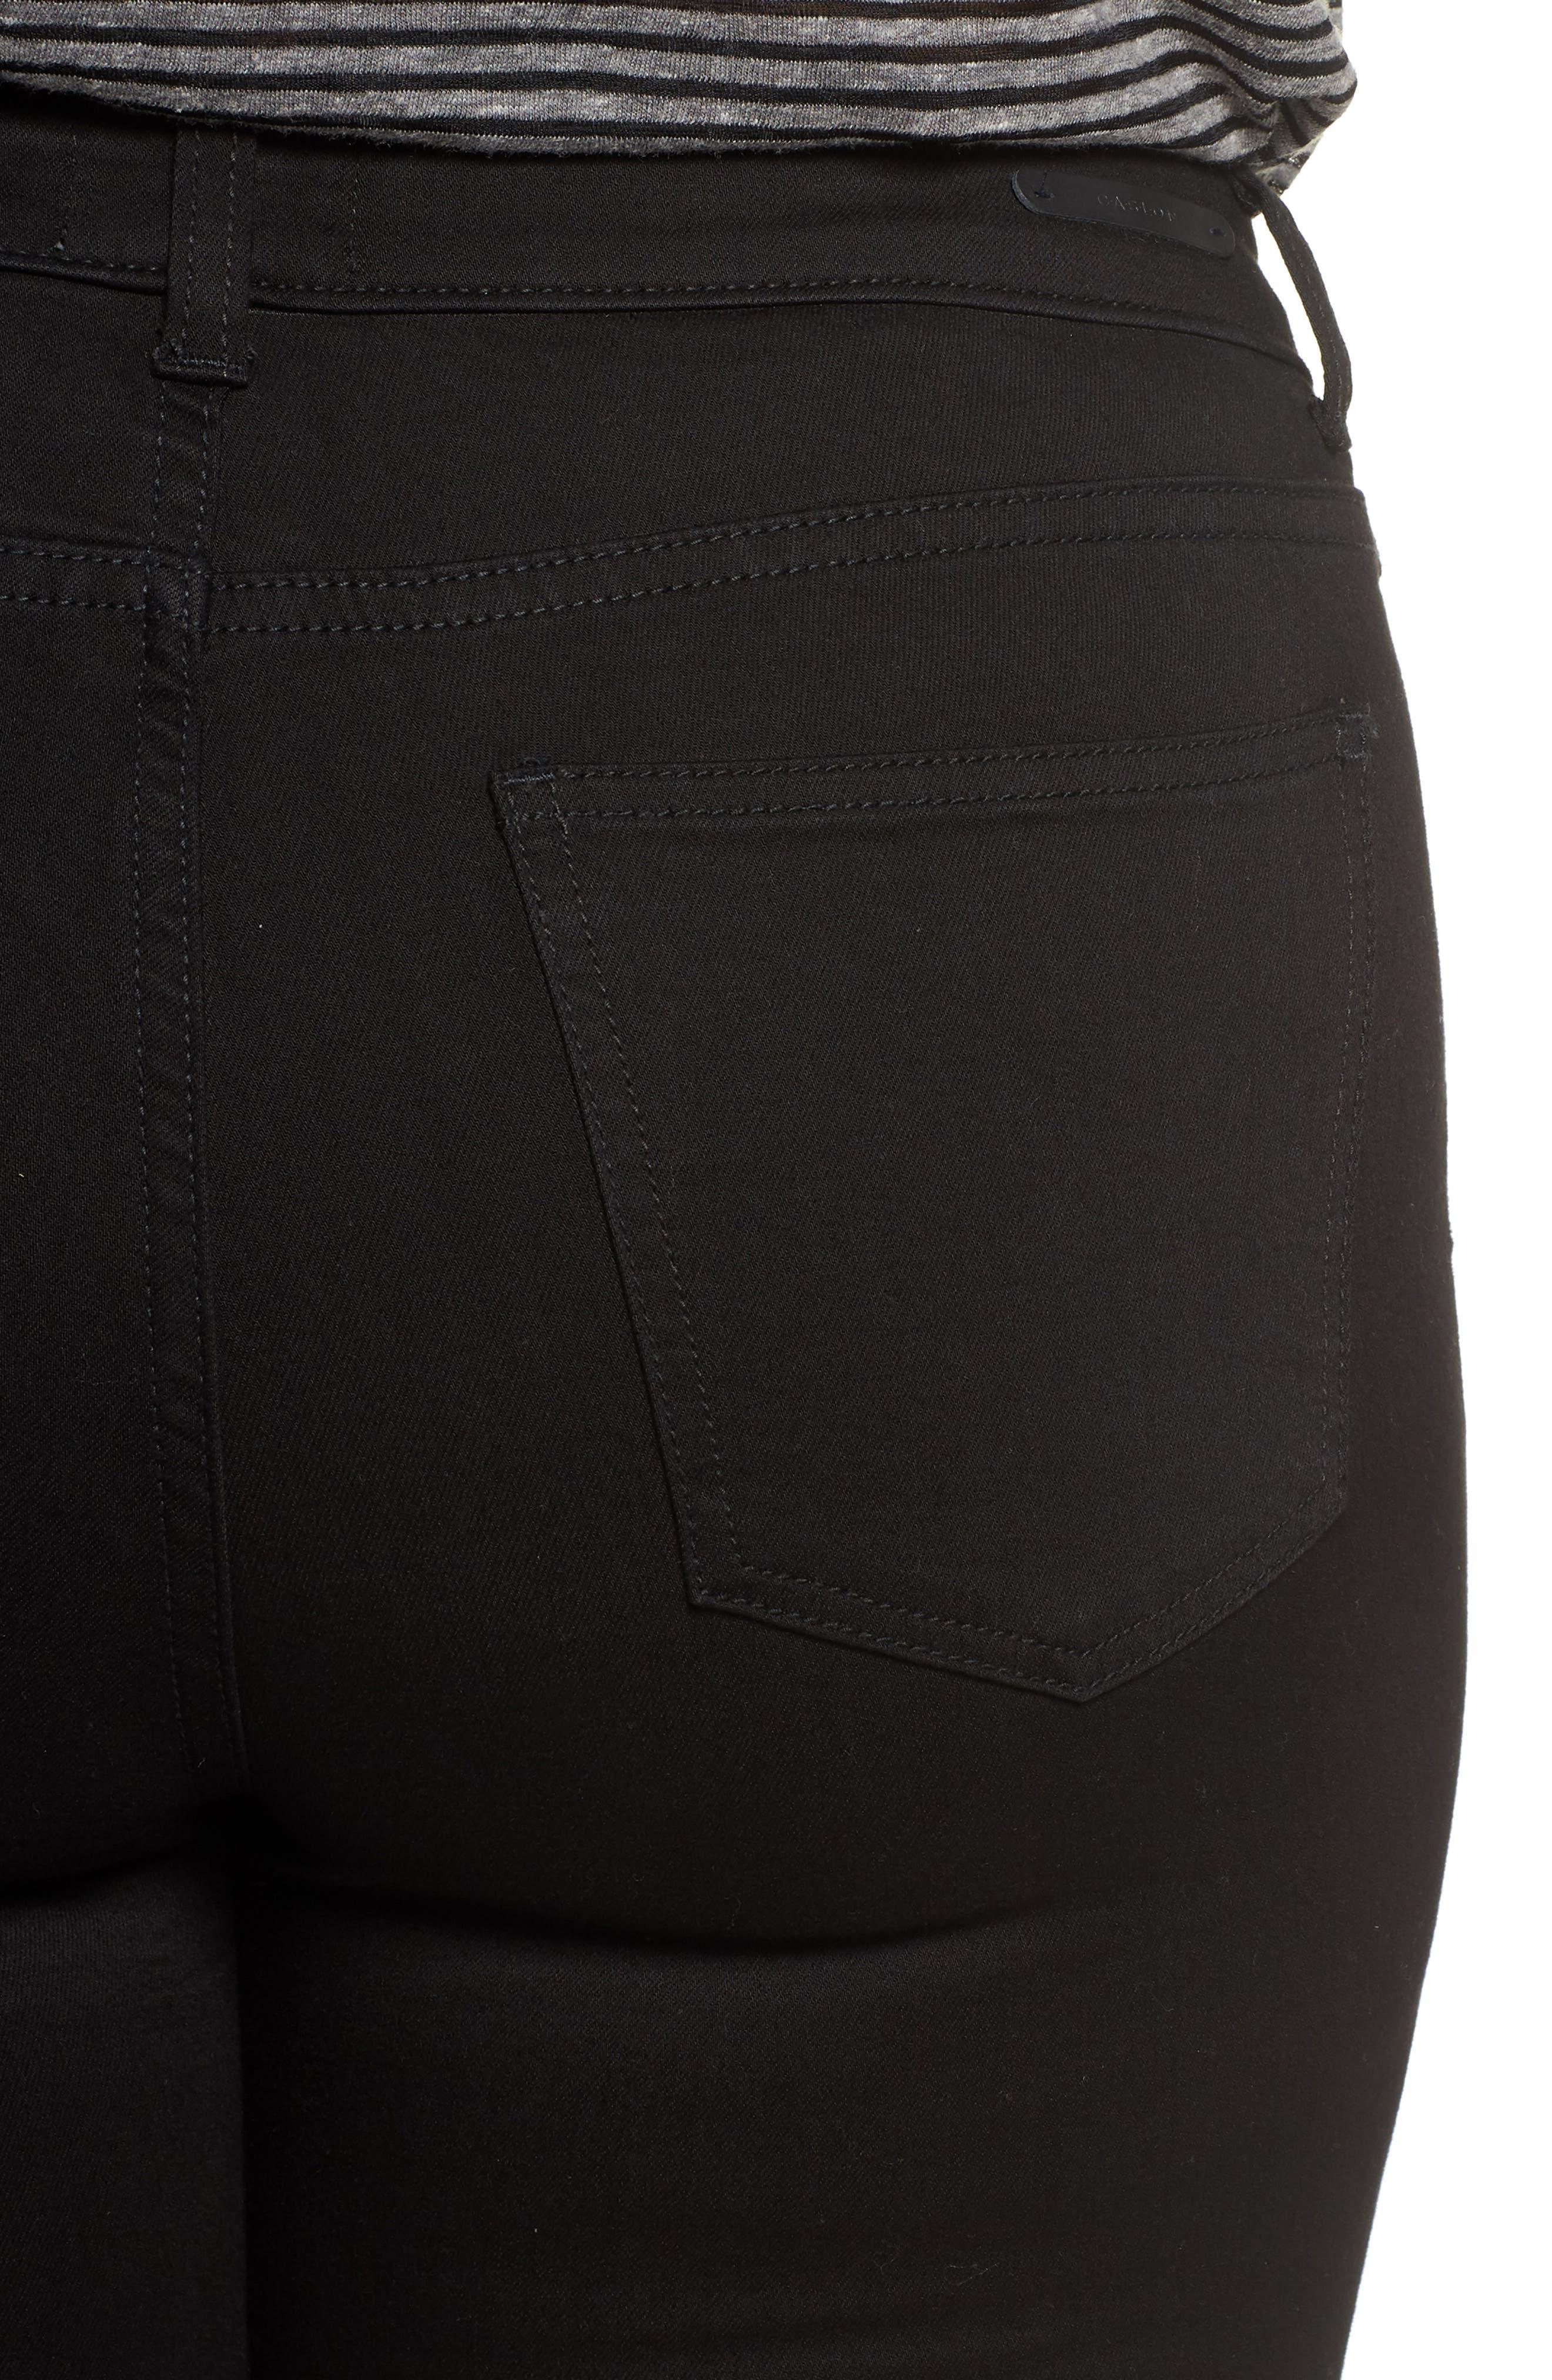 Stretch Skinny Jeans,                             Alternate thumbnail 4, color,                             BLACK WASH